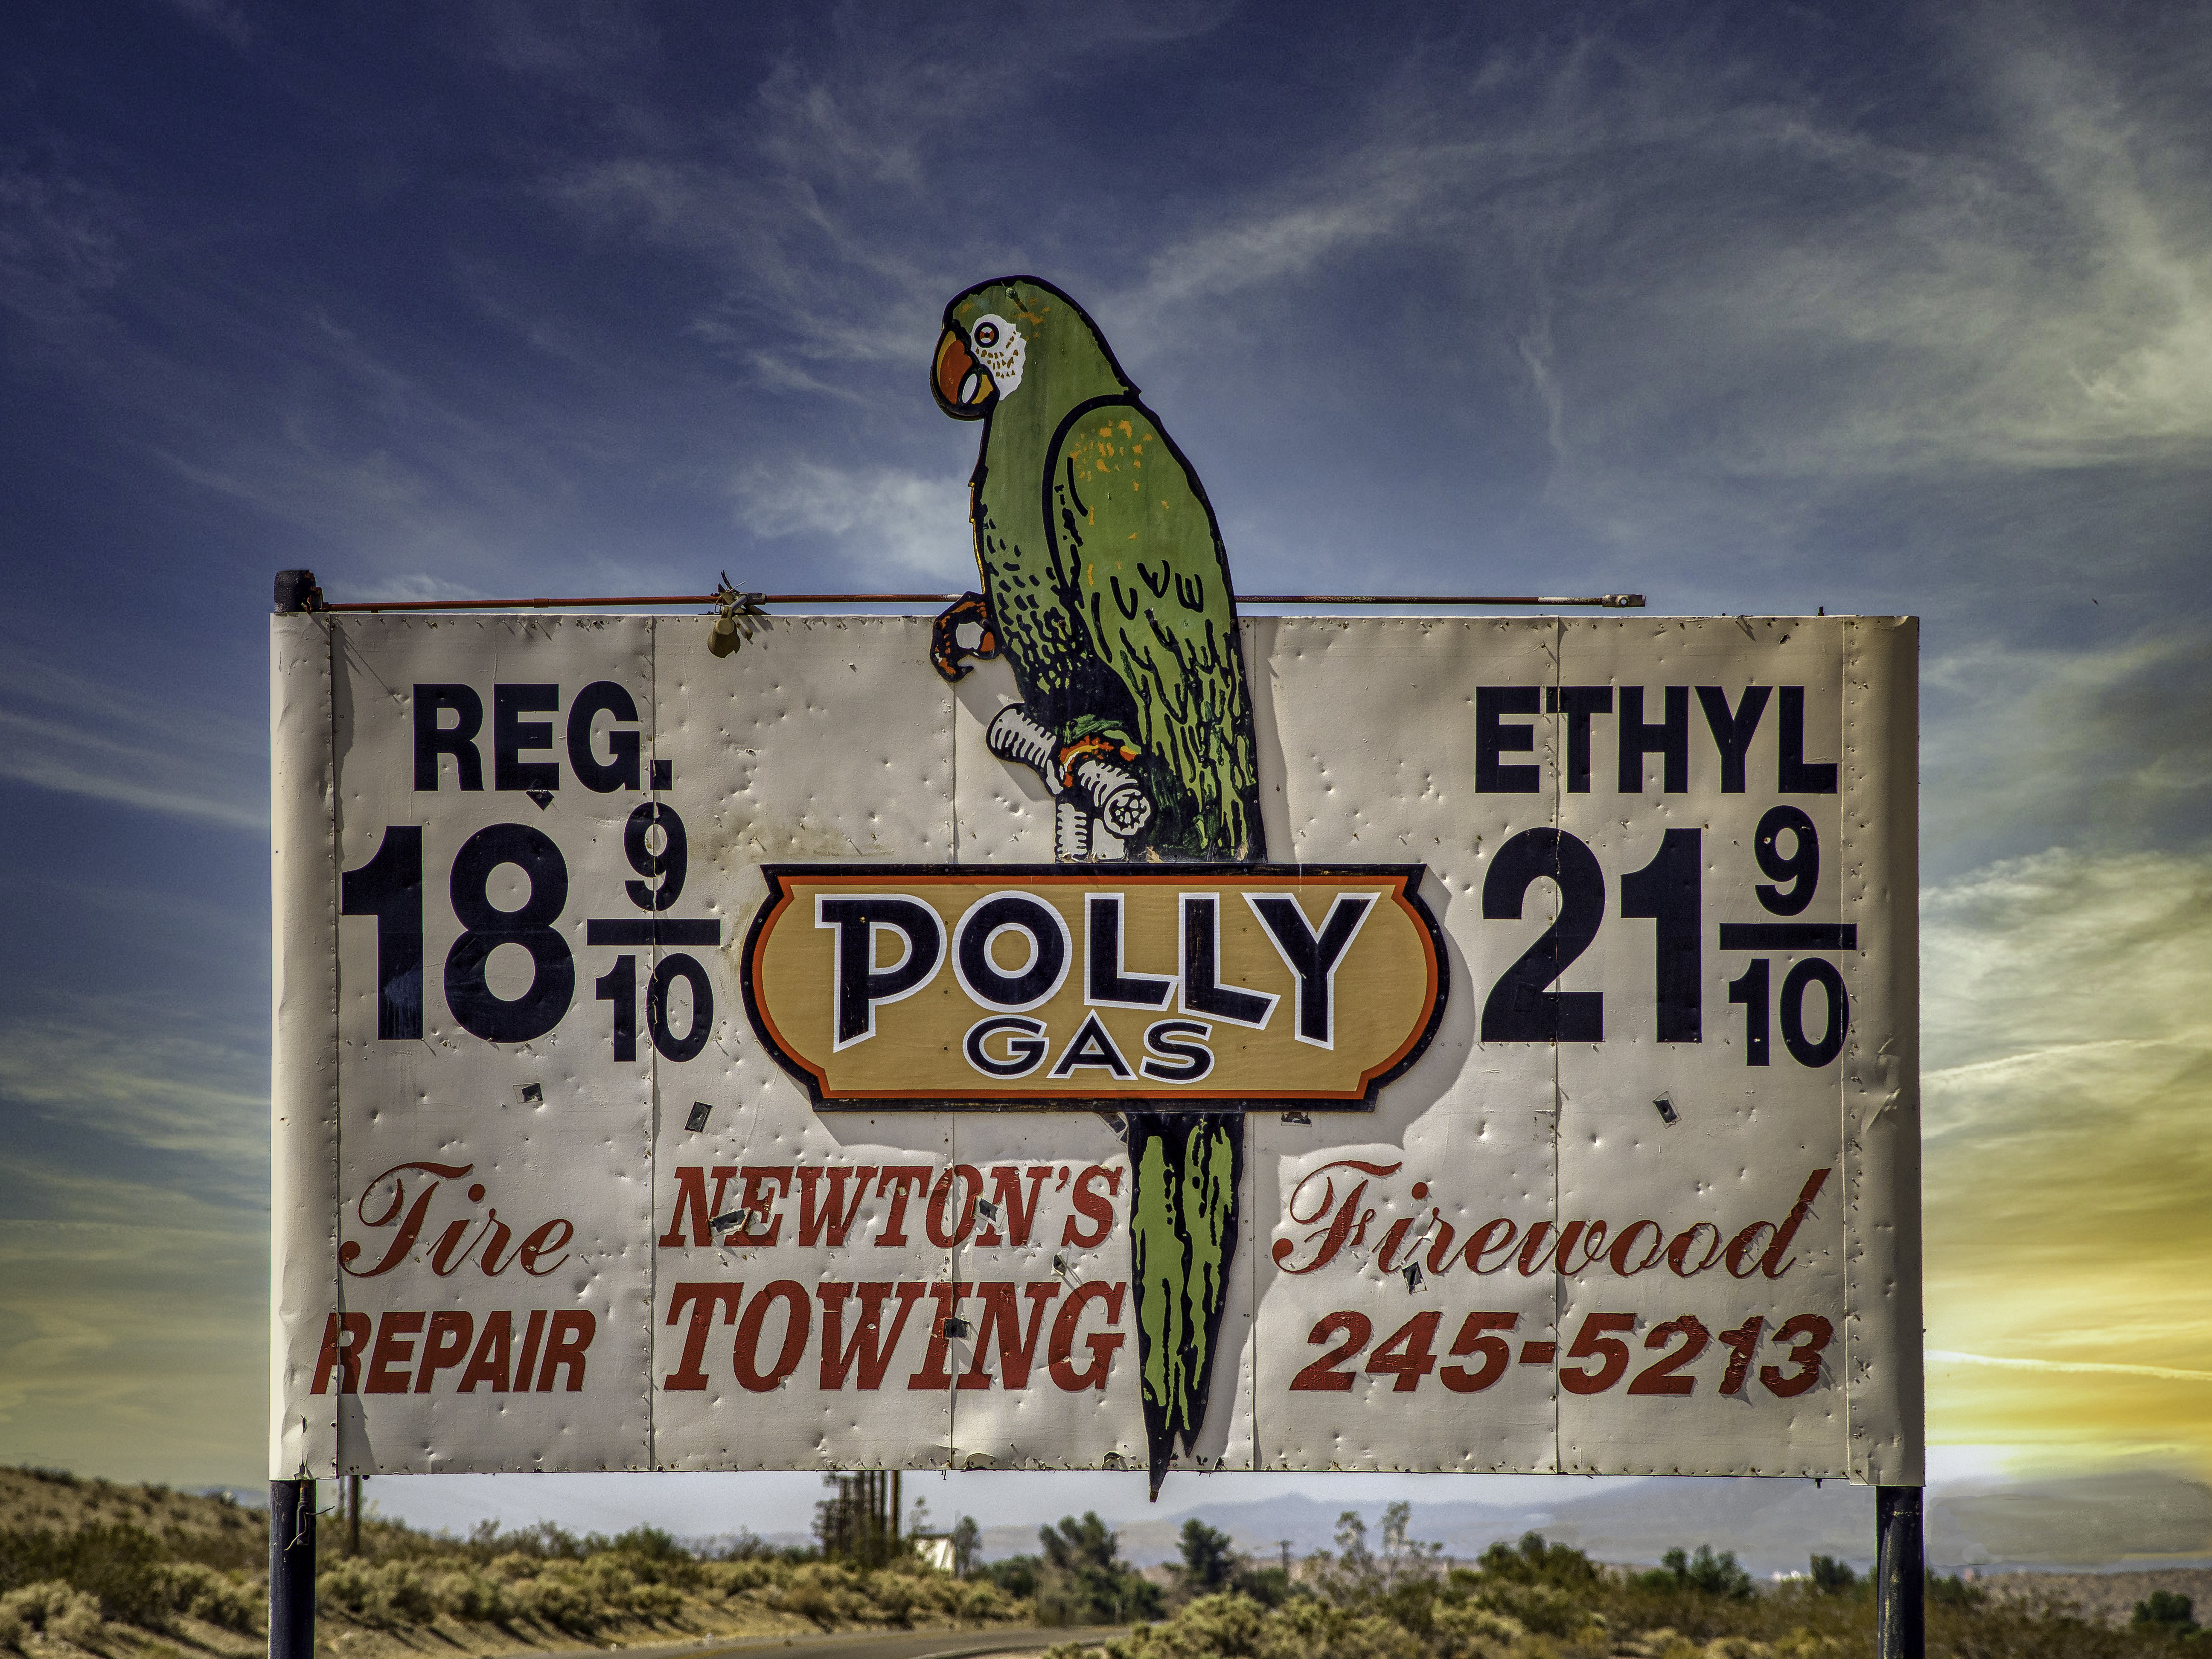 Polly Gas billboard - Helendale, California U.S.A. - June 5, 2018